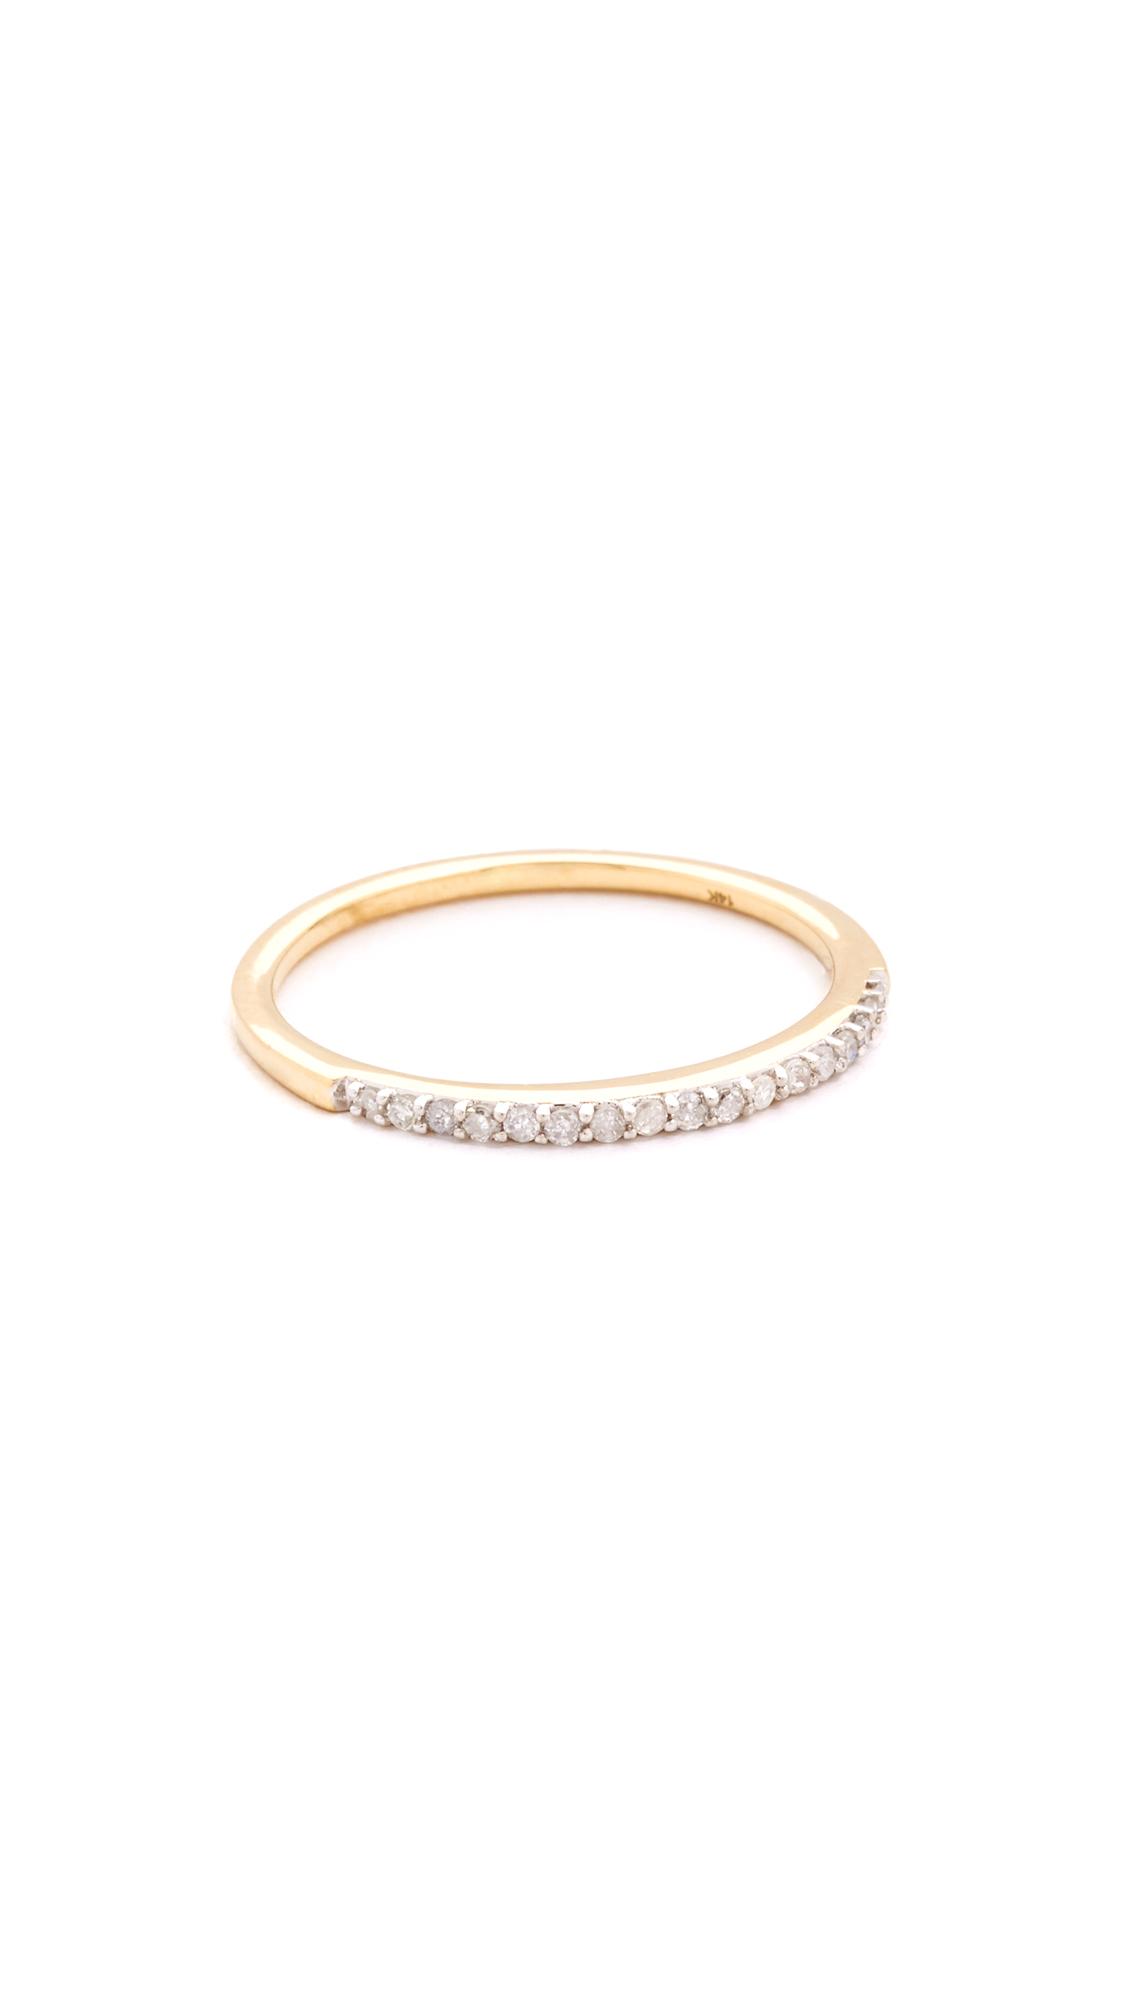 Adina Reyter Pave Band Ring - Gold